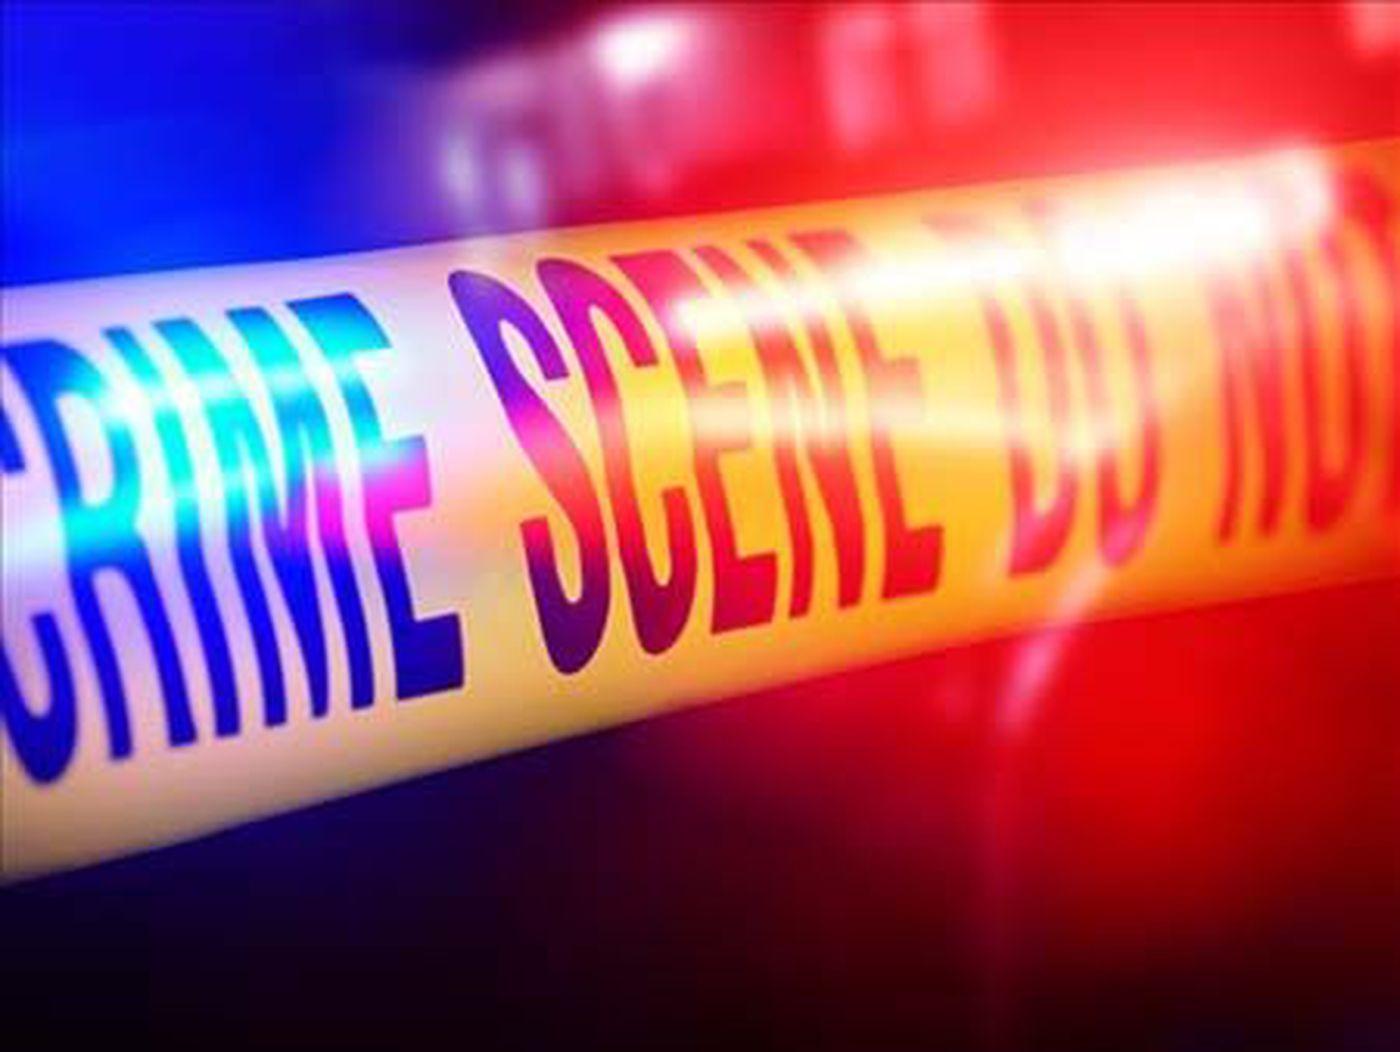 Report: Shots fired at Winston-Salem high school